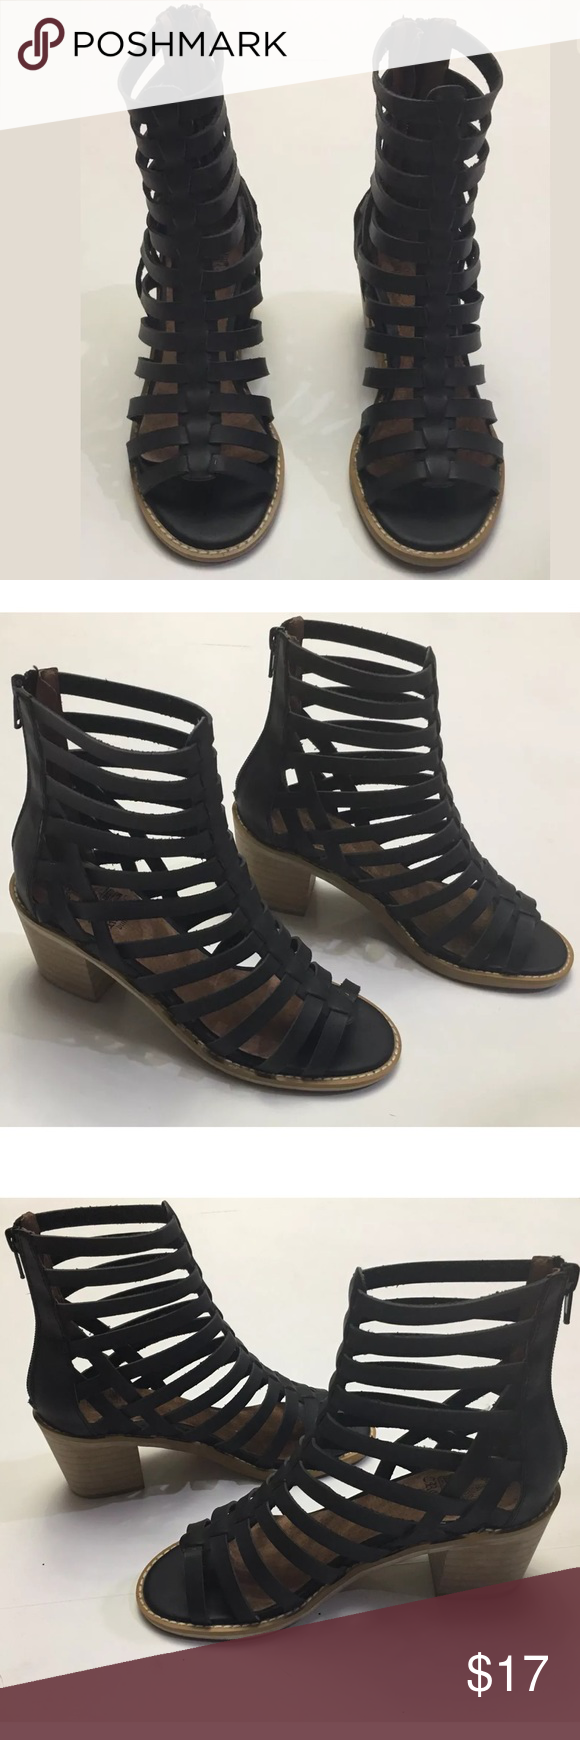 5bf2da08402b Crown Vintage Black Annika Gladiator Sandals Woman s Crown Vintage Black  Gladiator zip sandals in great condition Size 5.5 Zipper back Black leather  Block ...